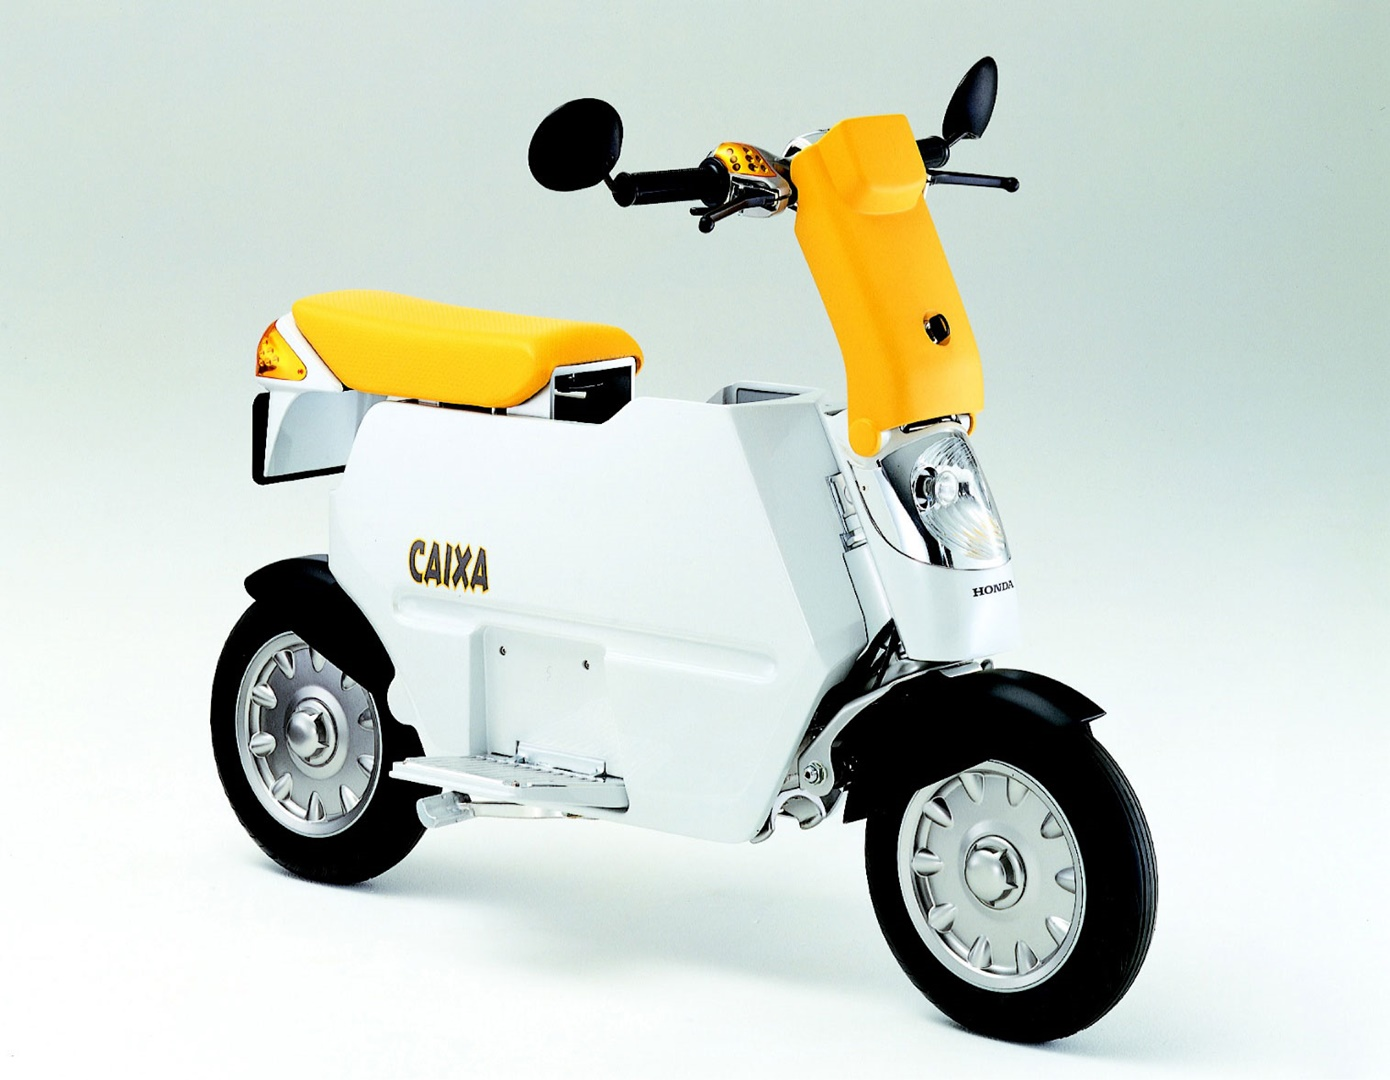 Moto del día: Honda Caixa Concept